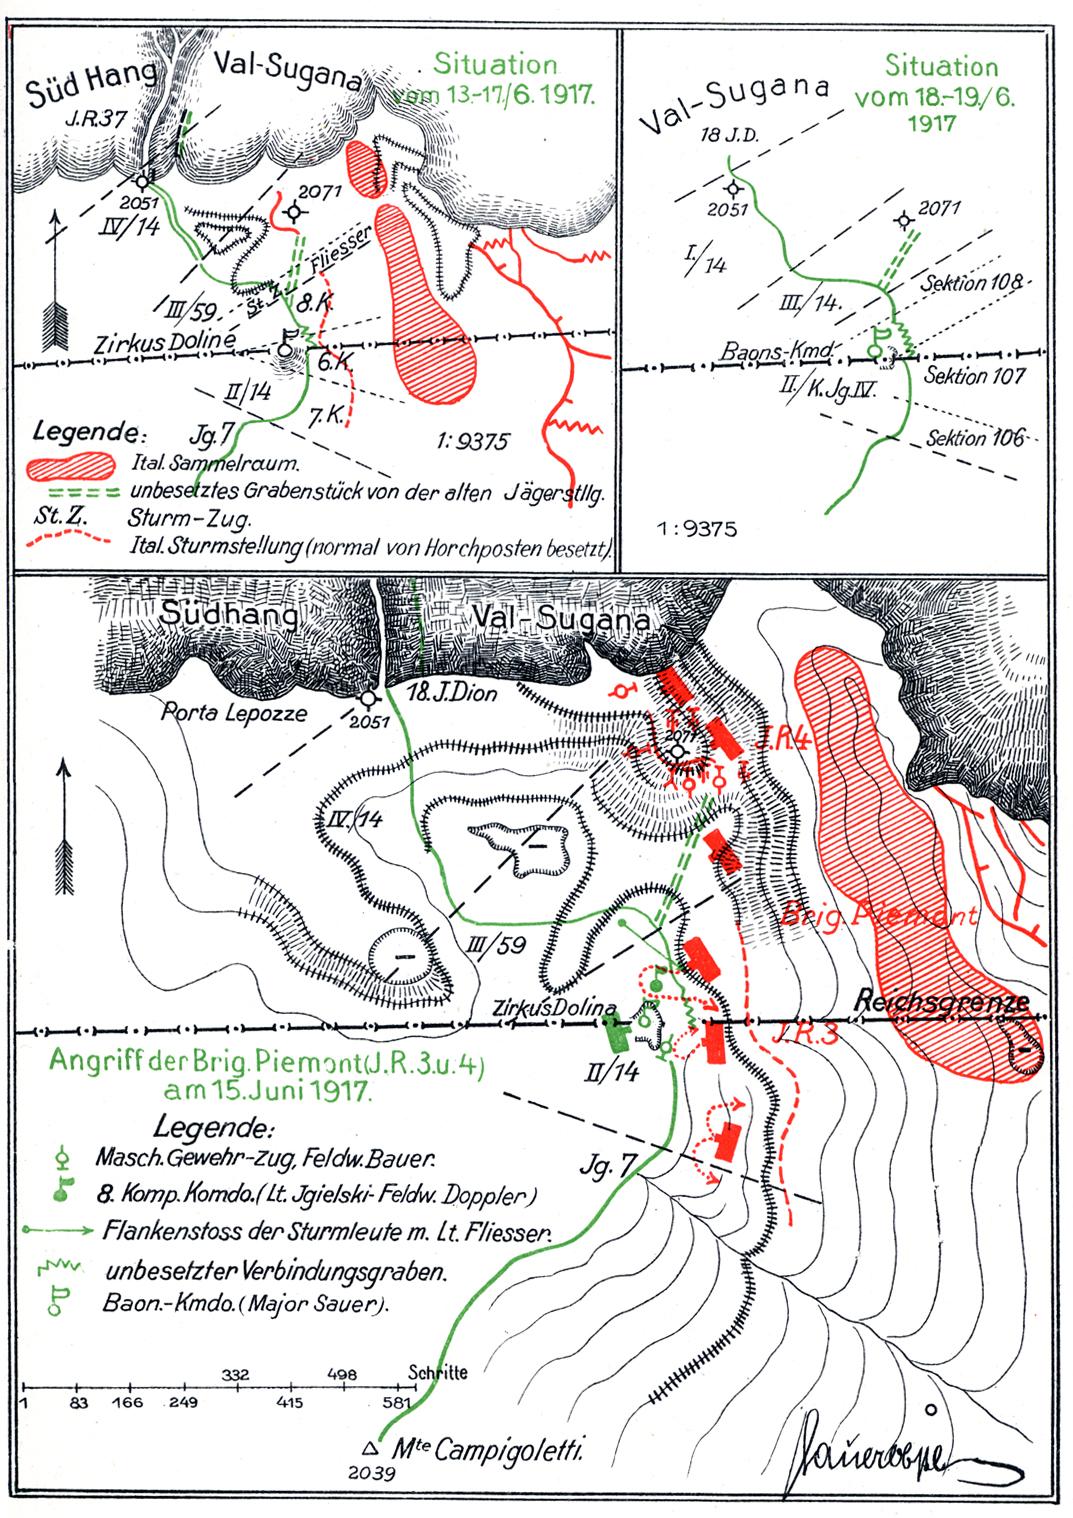 30 - 14° Hessen - Cartine batt. Ortigara dal 13 al 15 giugno 1917.jpg